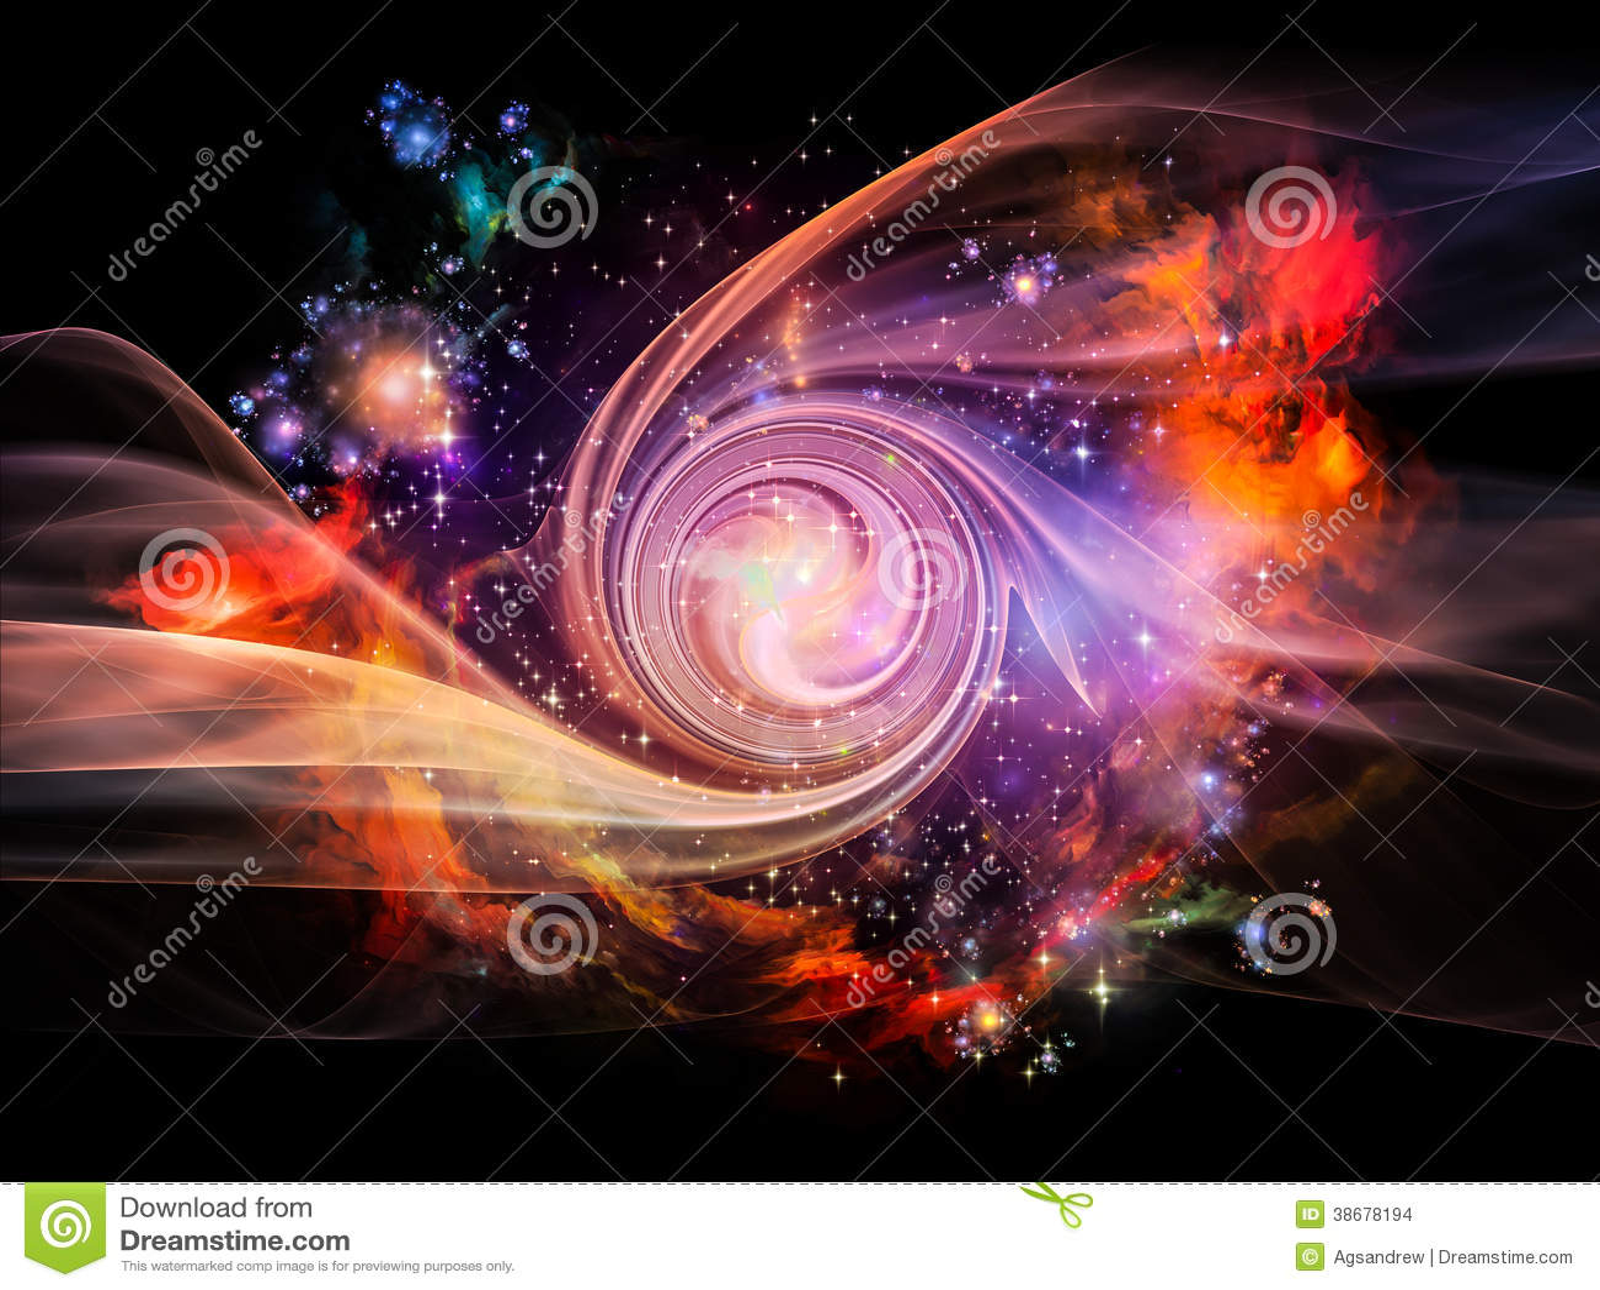 Stock Images Nebula Vortex Space Series Interplay Translucent Fractal ...